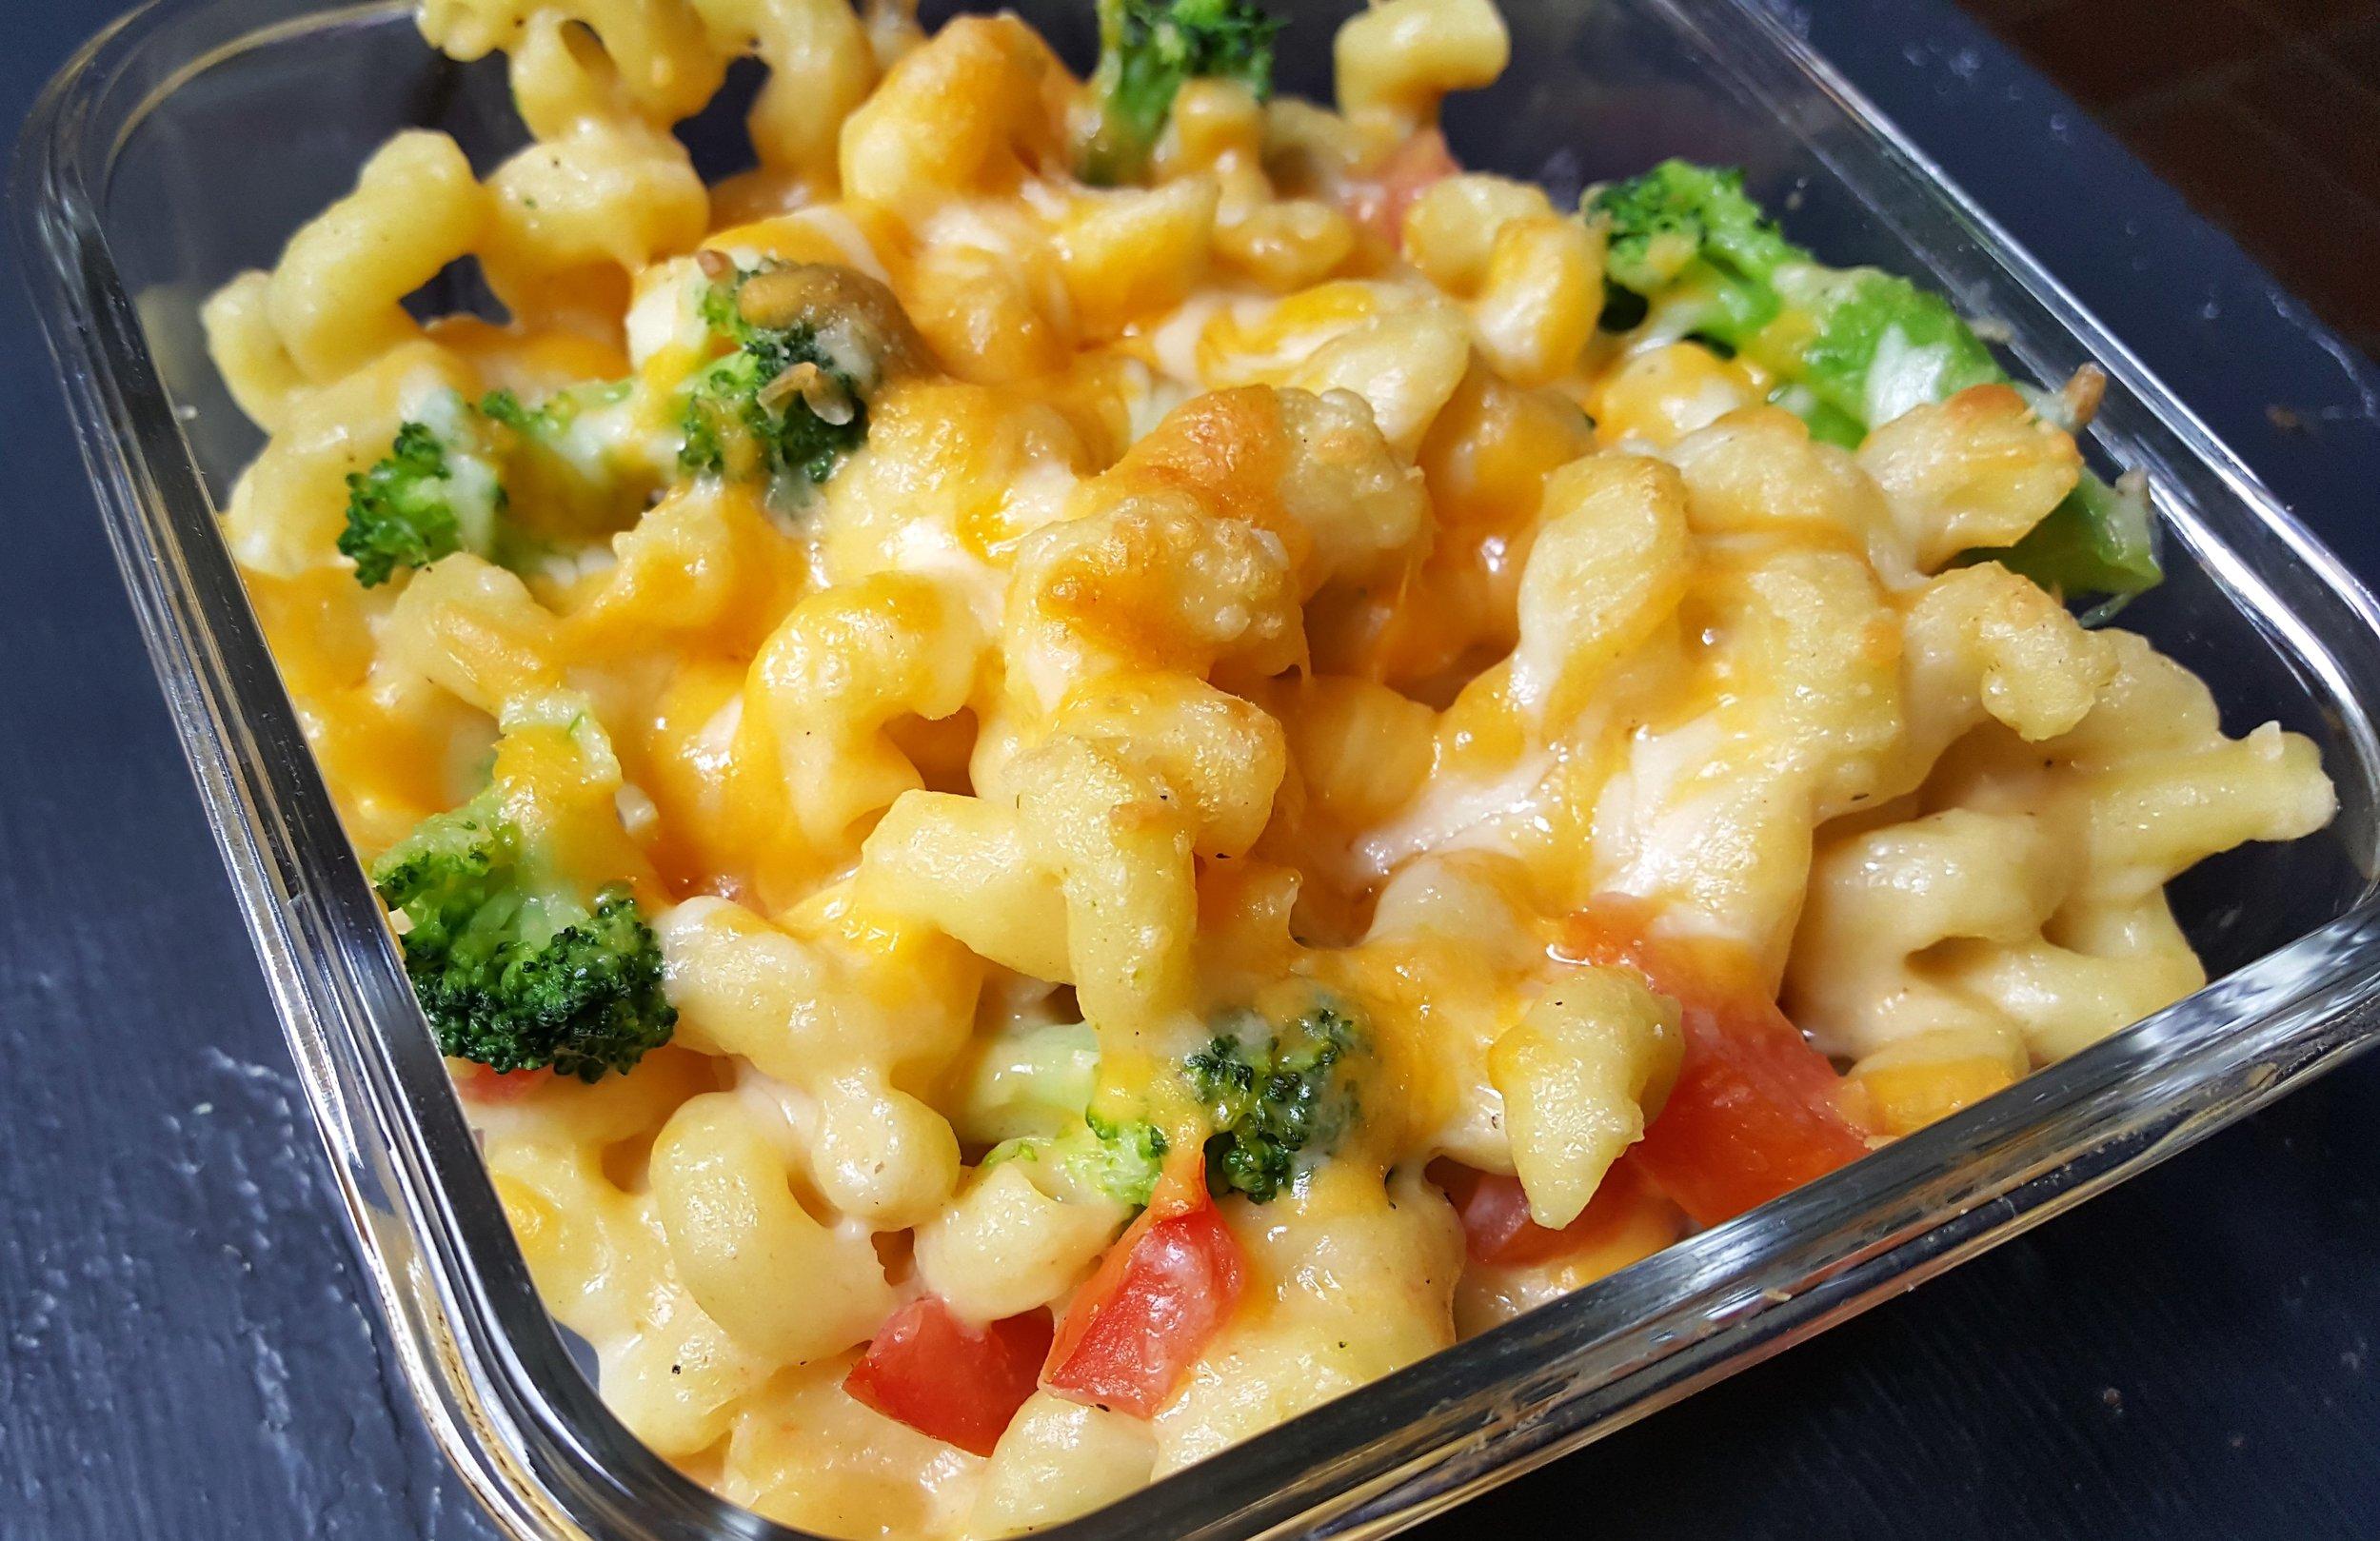 Vegetarian-friendly Macaroni & Cheese with Fresh Roma Tomatoes & Broccoli Florets